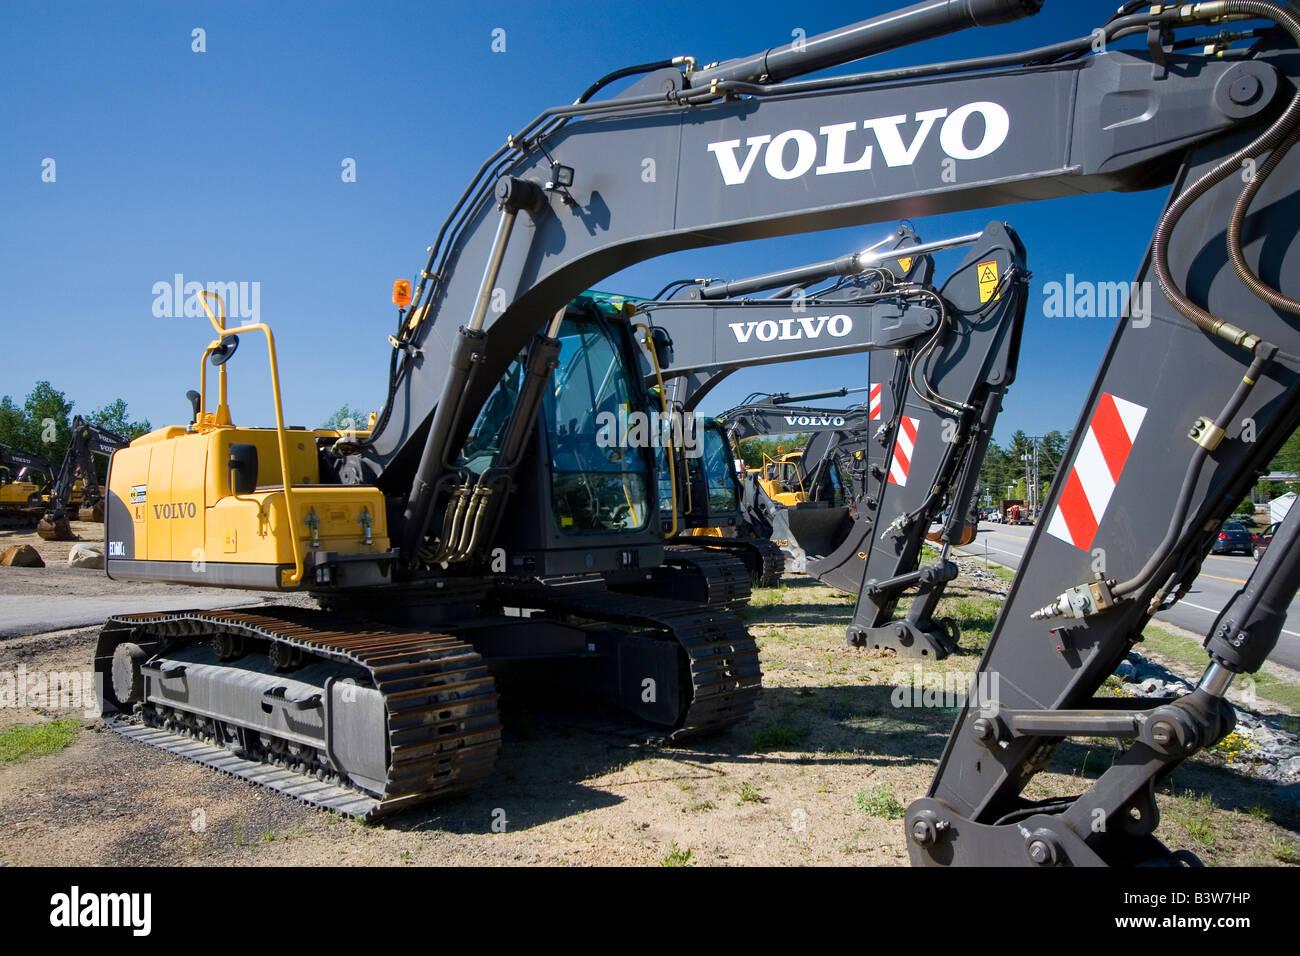 Volvo excavator factory in Kaluga 65